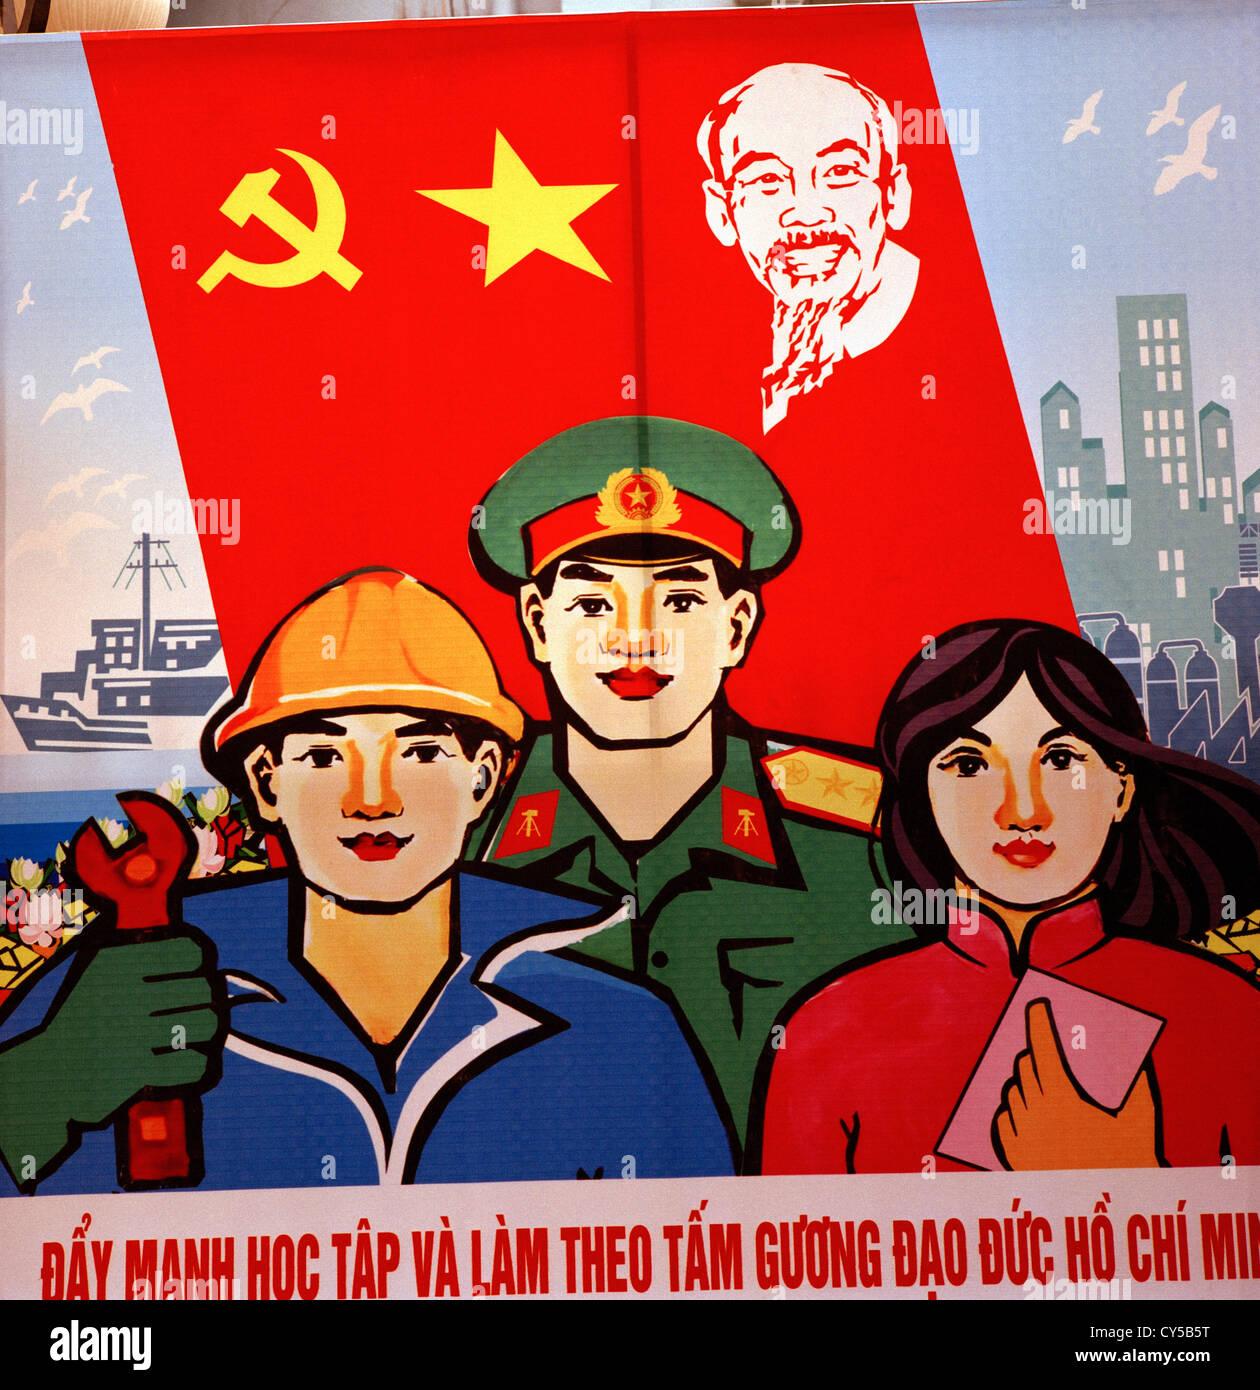 Political propaganda in Hanoi in Vietnam in Far East Southeast Asia. Politics Communism Socialism Communist Socialist - Stock Image